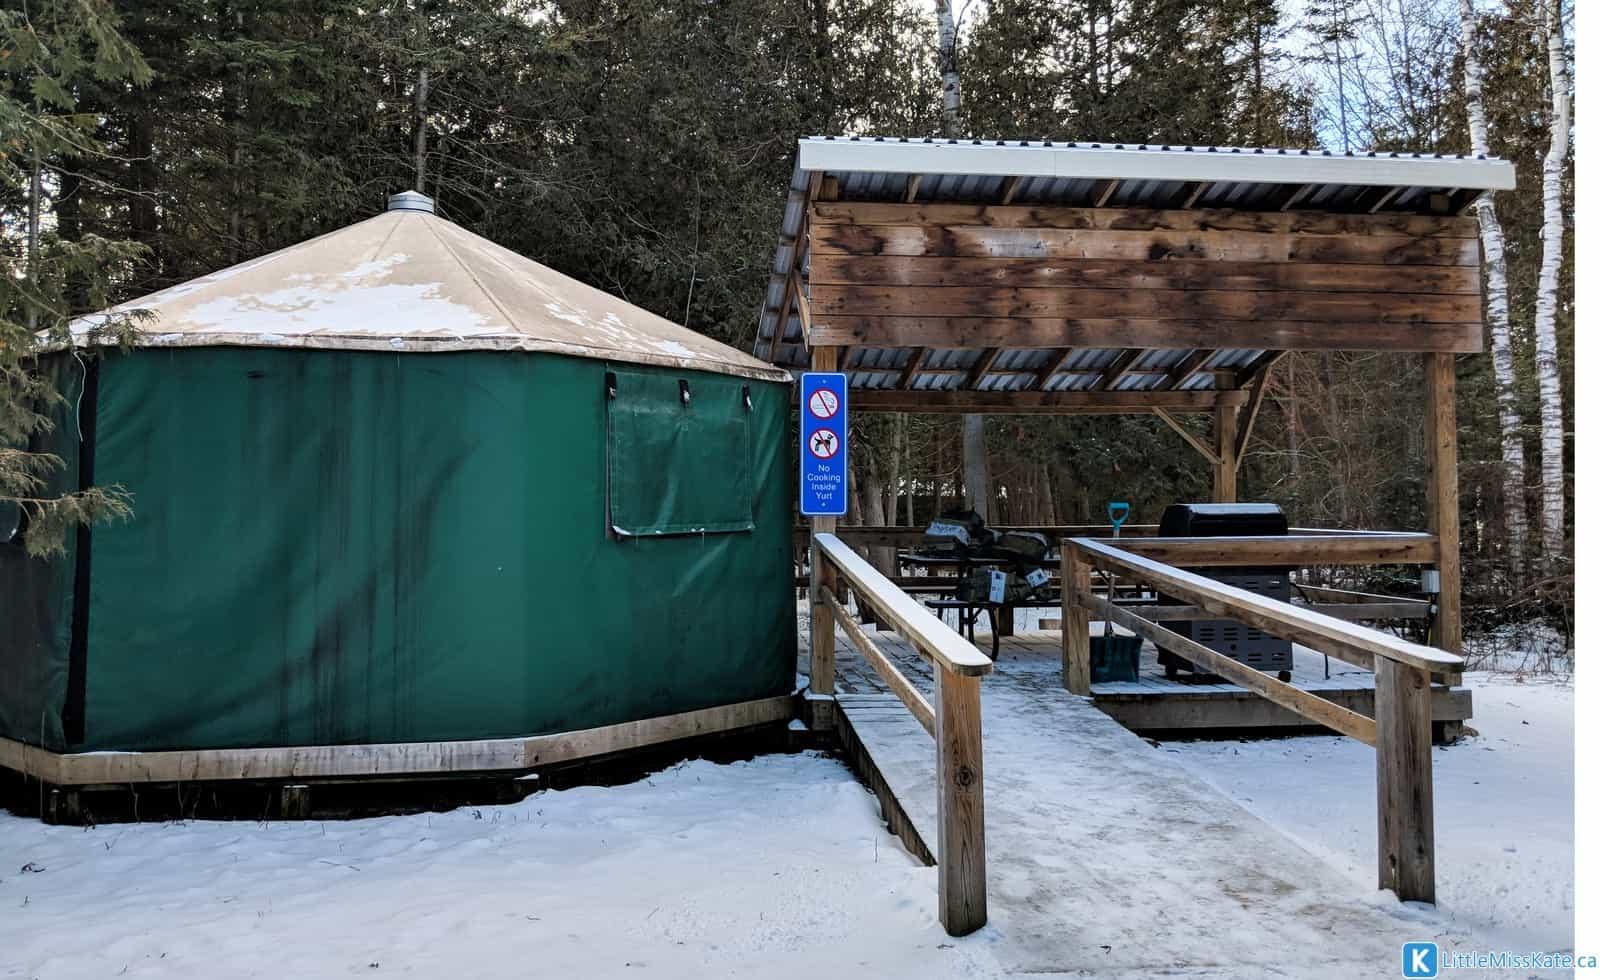 Glamping Ontario MacGregor Point Provincial Park Yurts